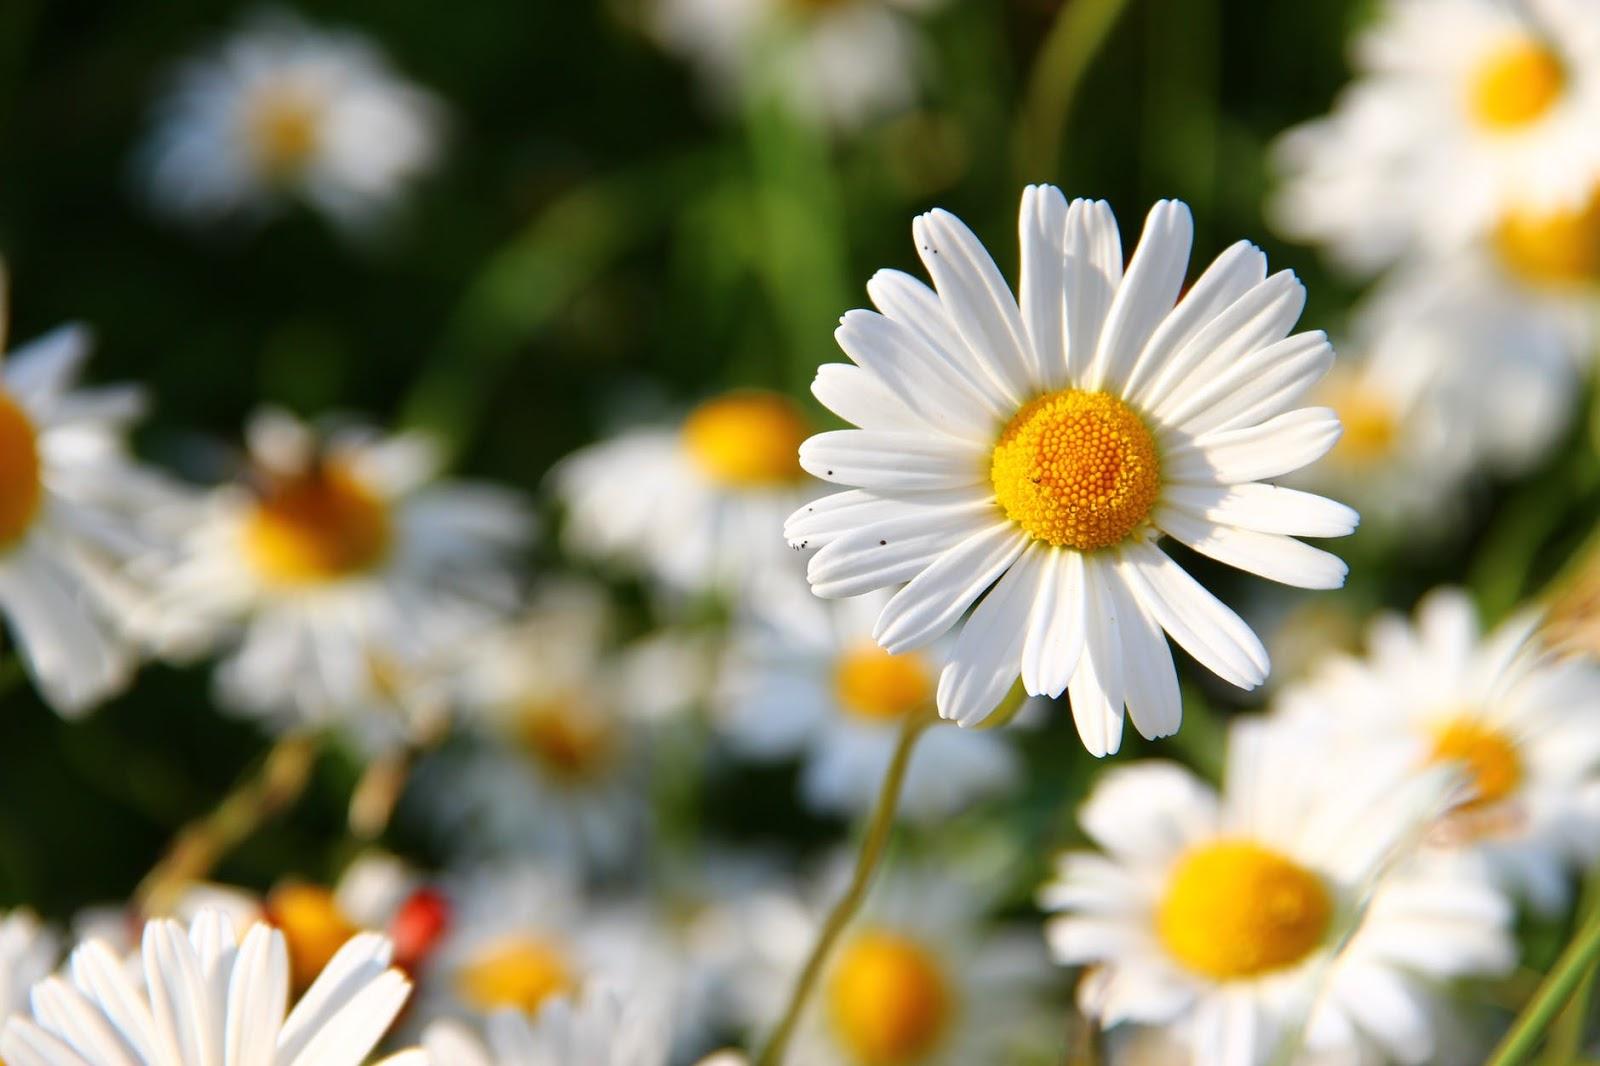 Flower wallpaper white daisy hd daisy wallpaper hd wallpaper daisies white flower face 59984 izmirmasajfo